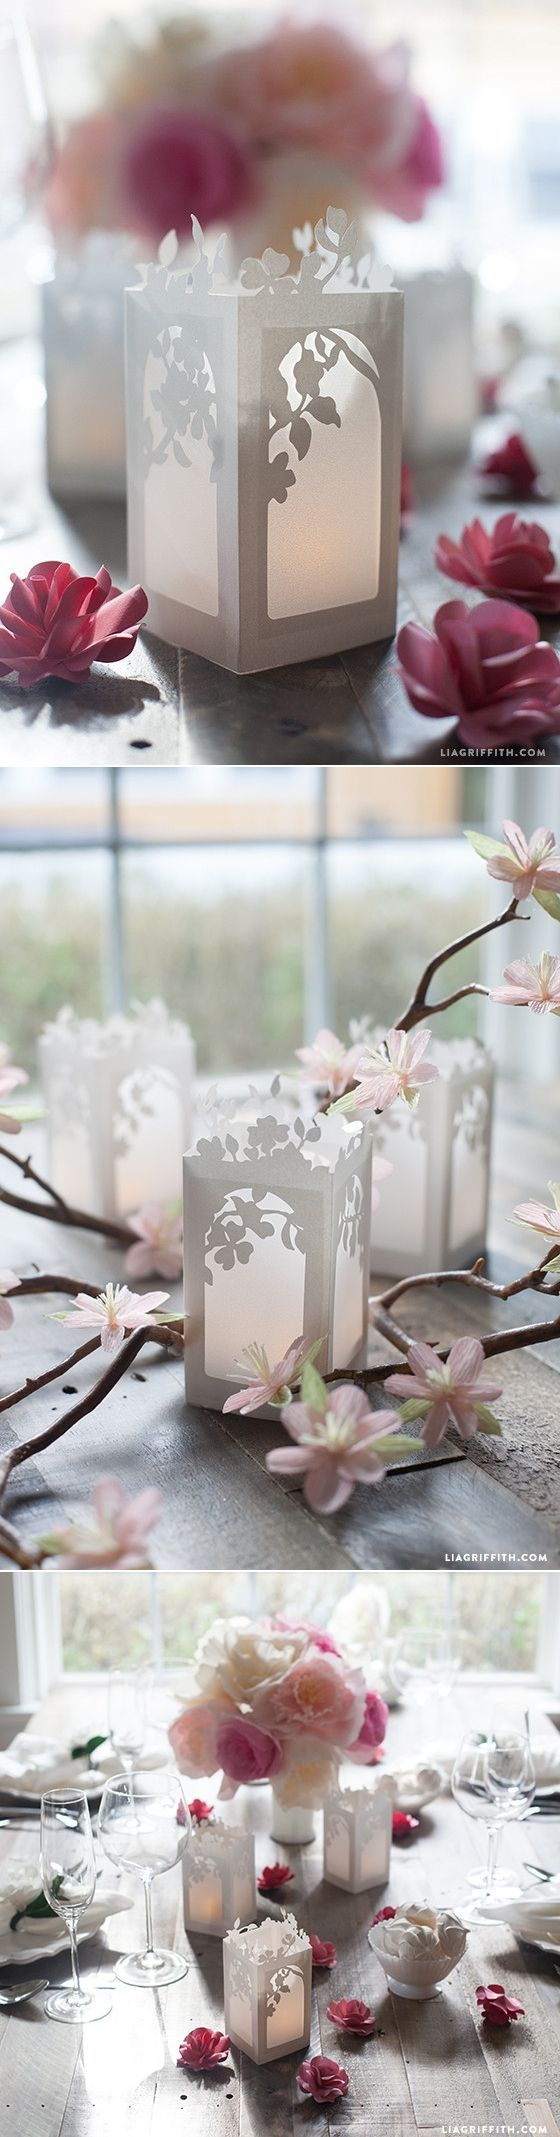 Spring in Bloom Paper Lanterns / http://www.himisspuff.com/diy-wedding-centerpieces-on-a-budget/46/